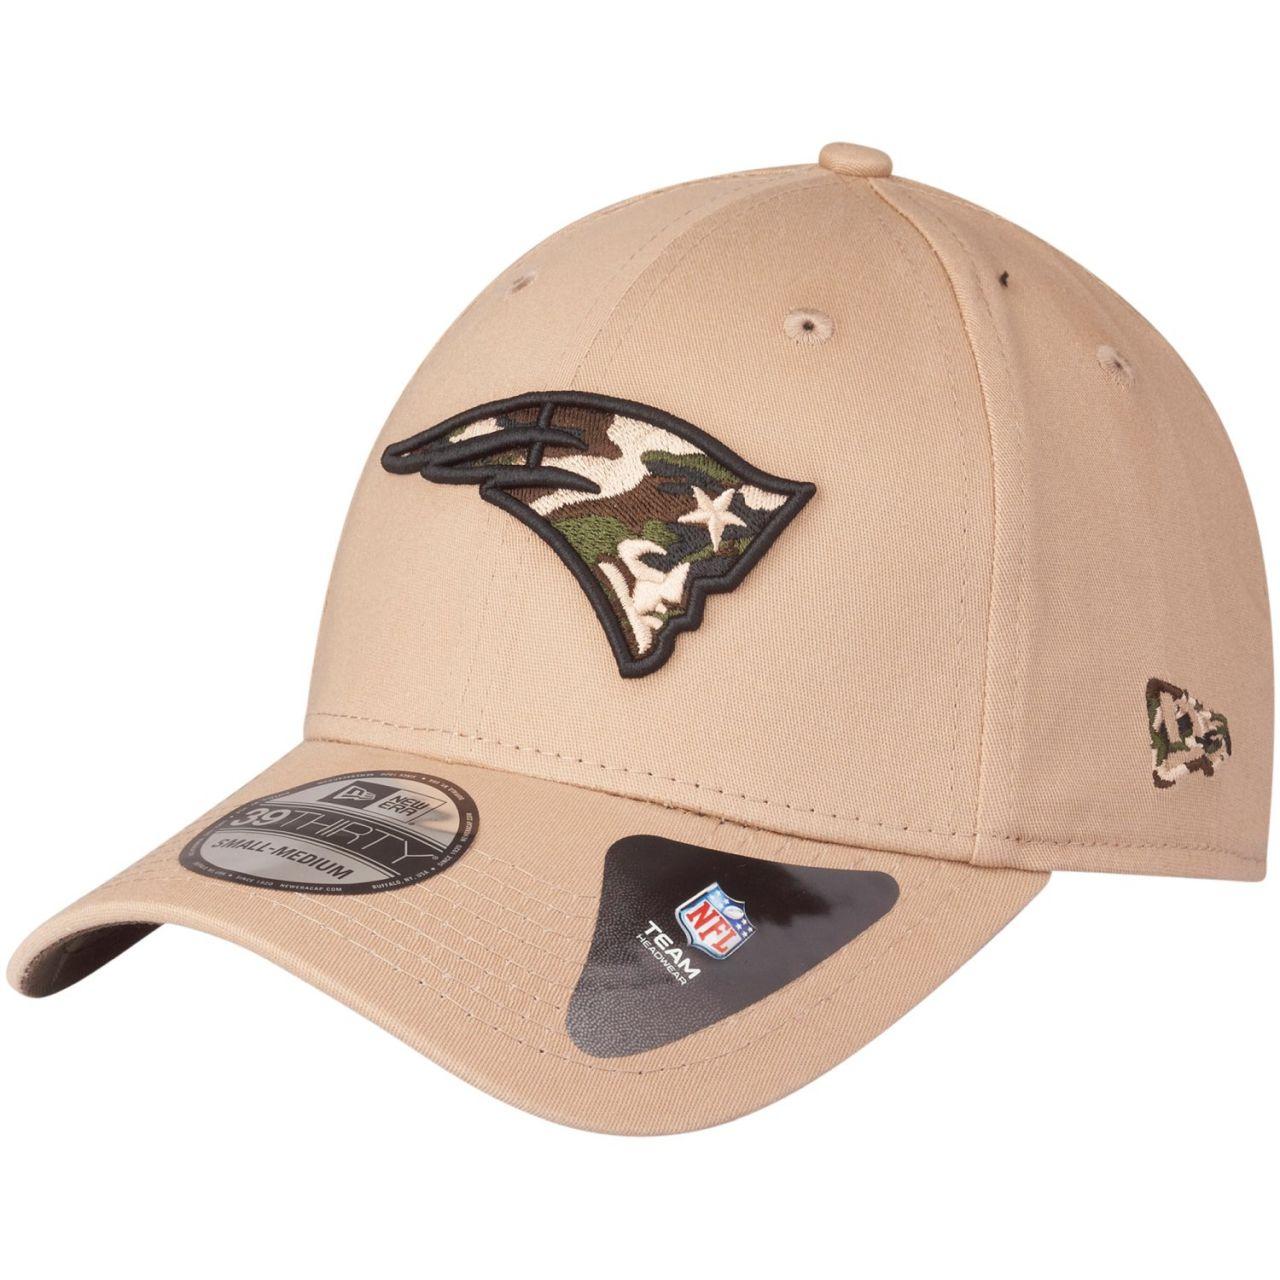 amfoo - New Era 39Thirty Stretch Cap - CAMO New England Patriots